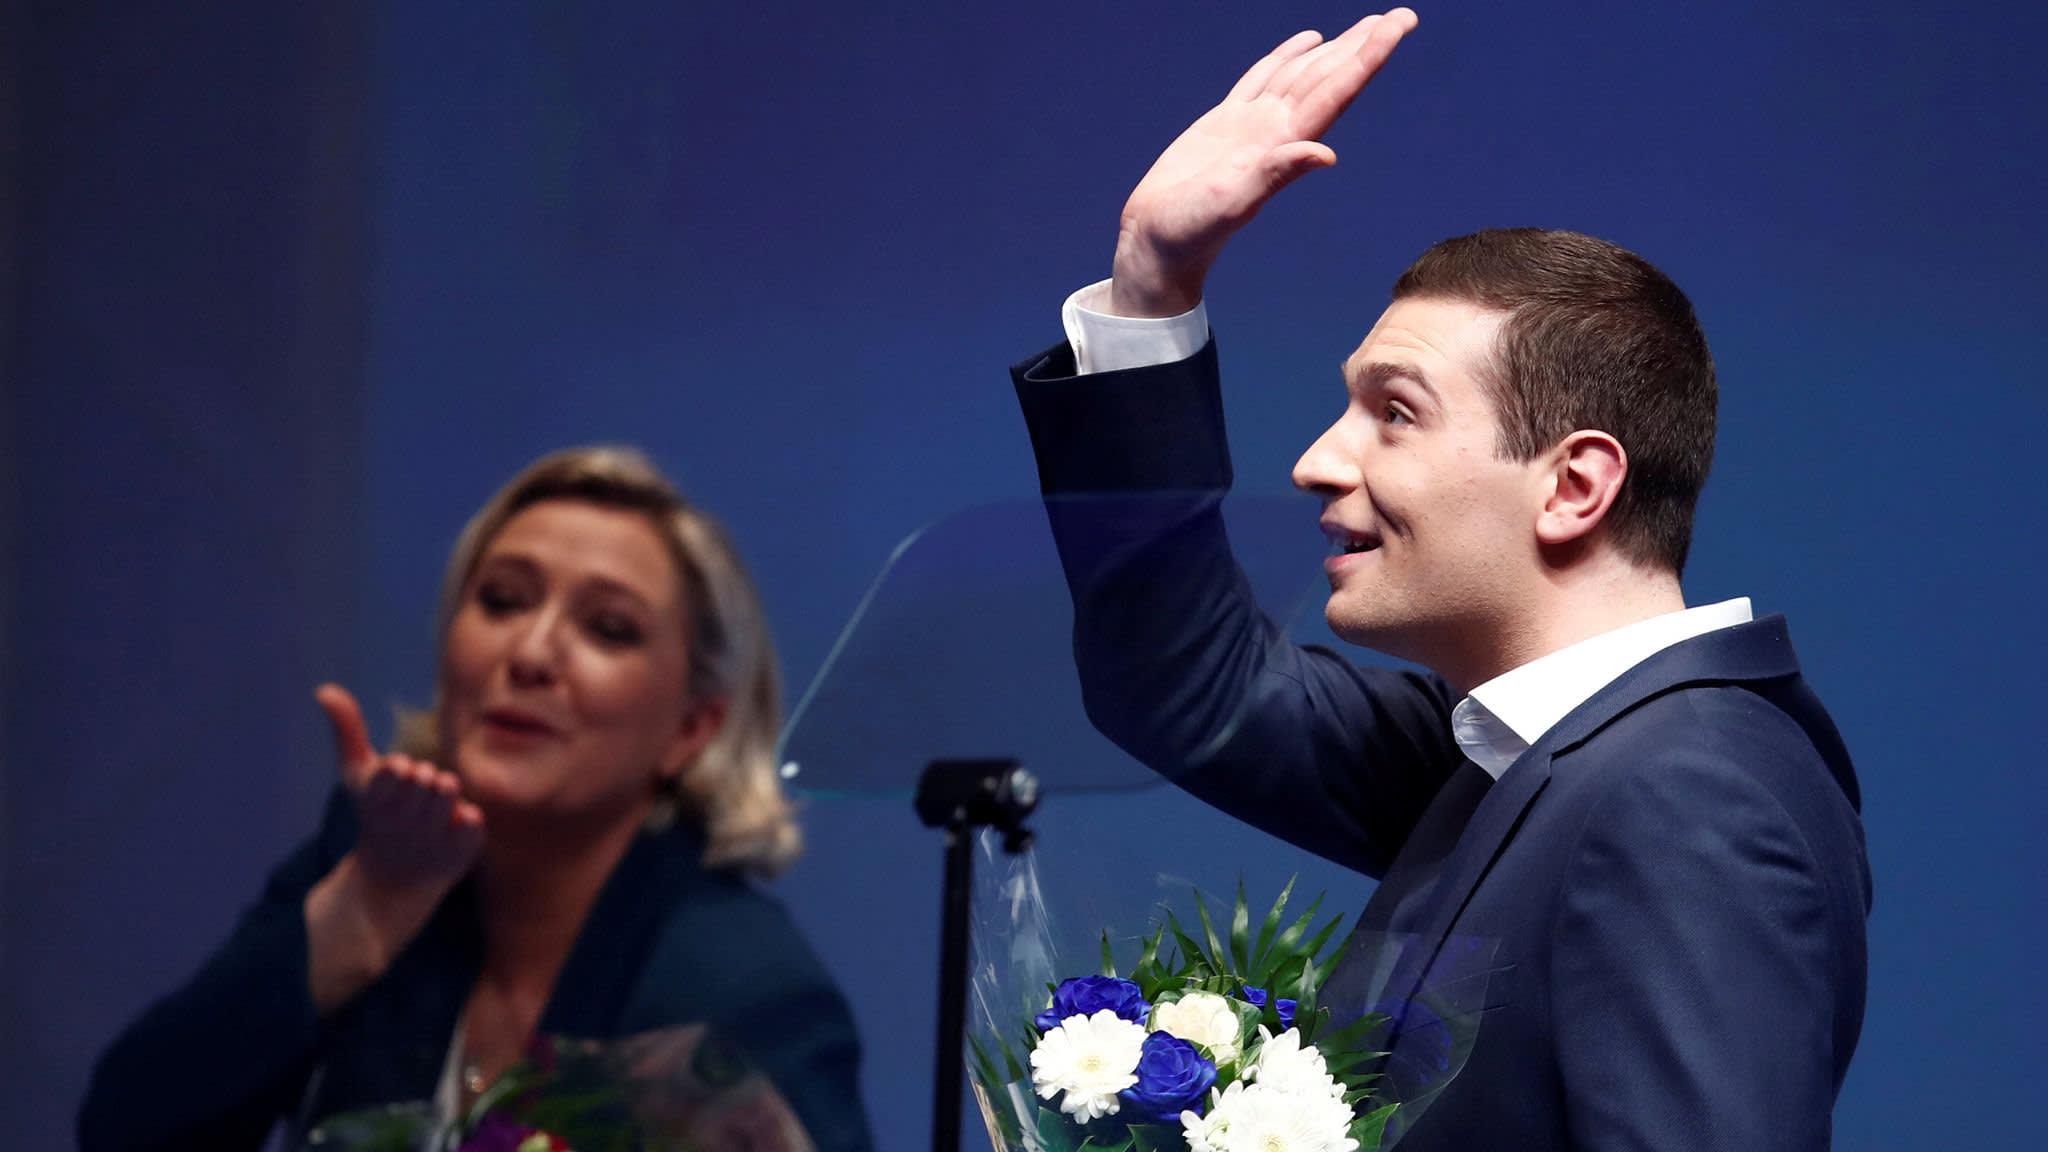 Le Pen protégé vows to reclaim sovereignty from EU